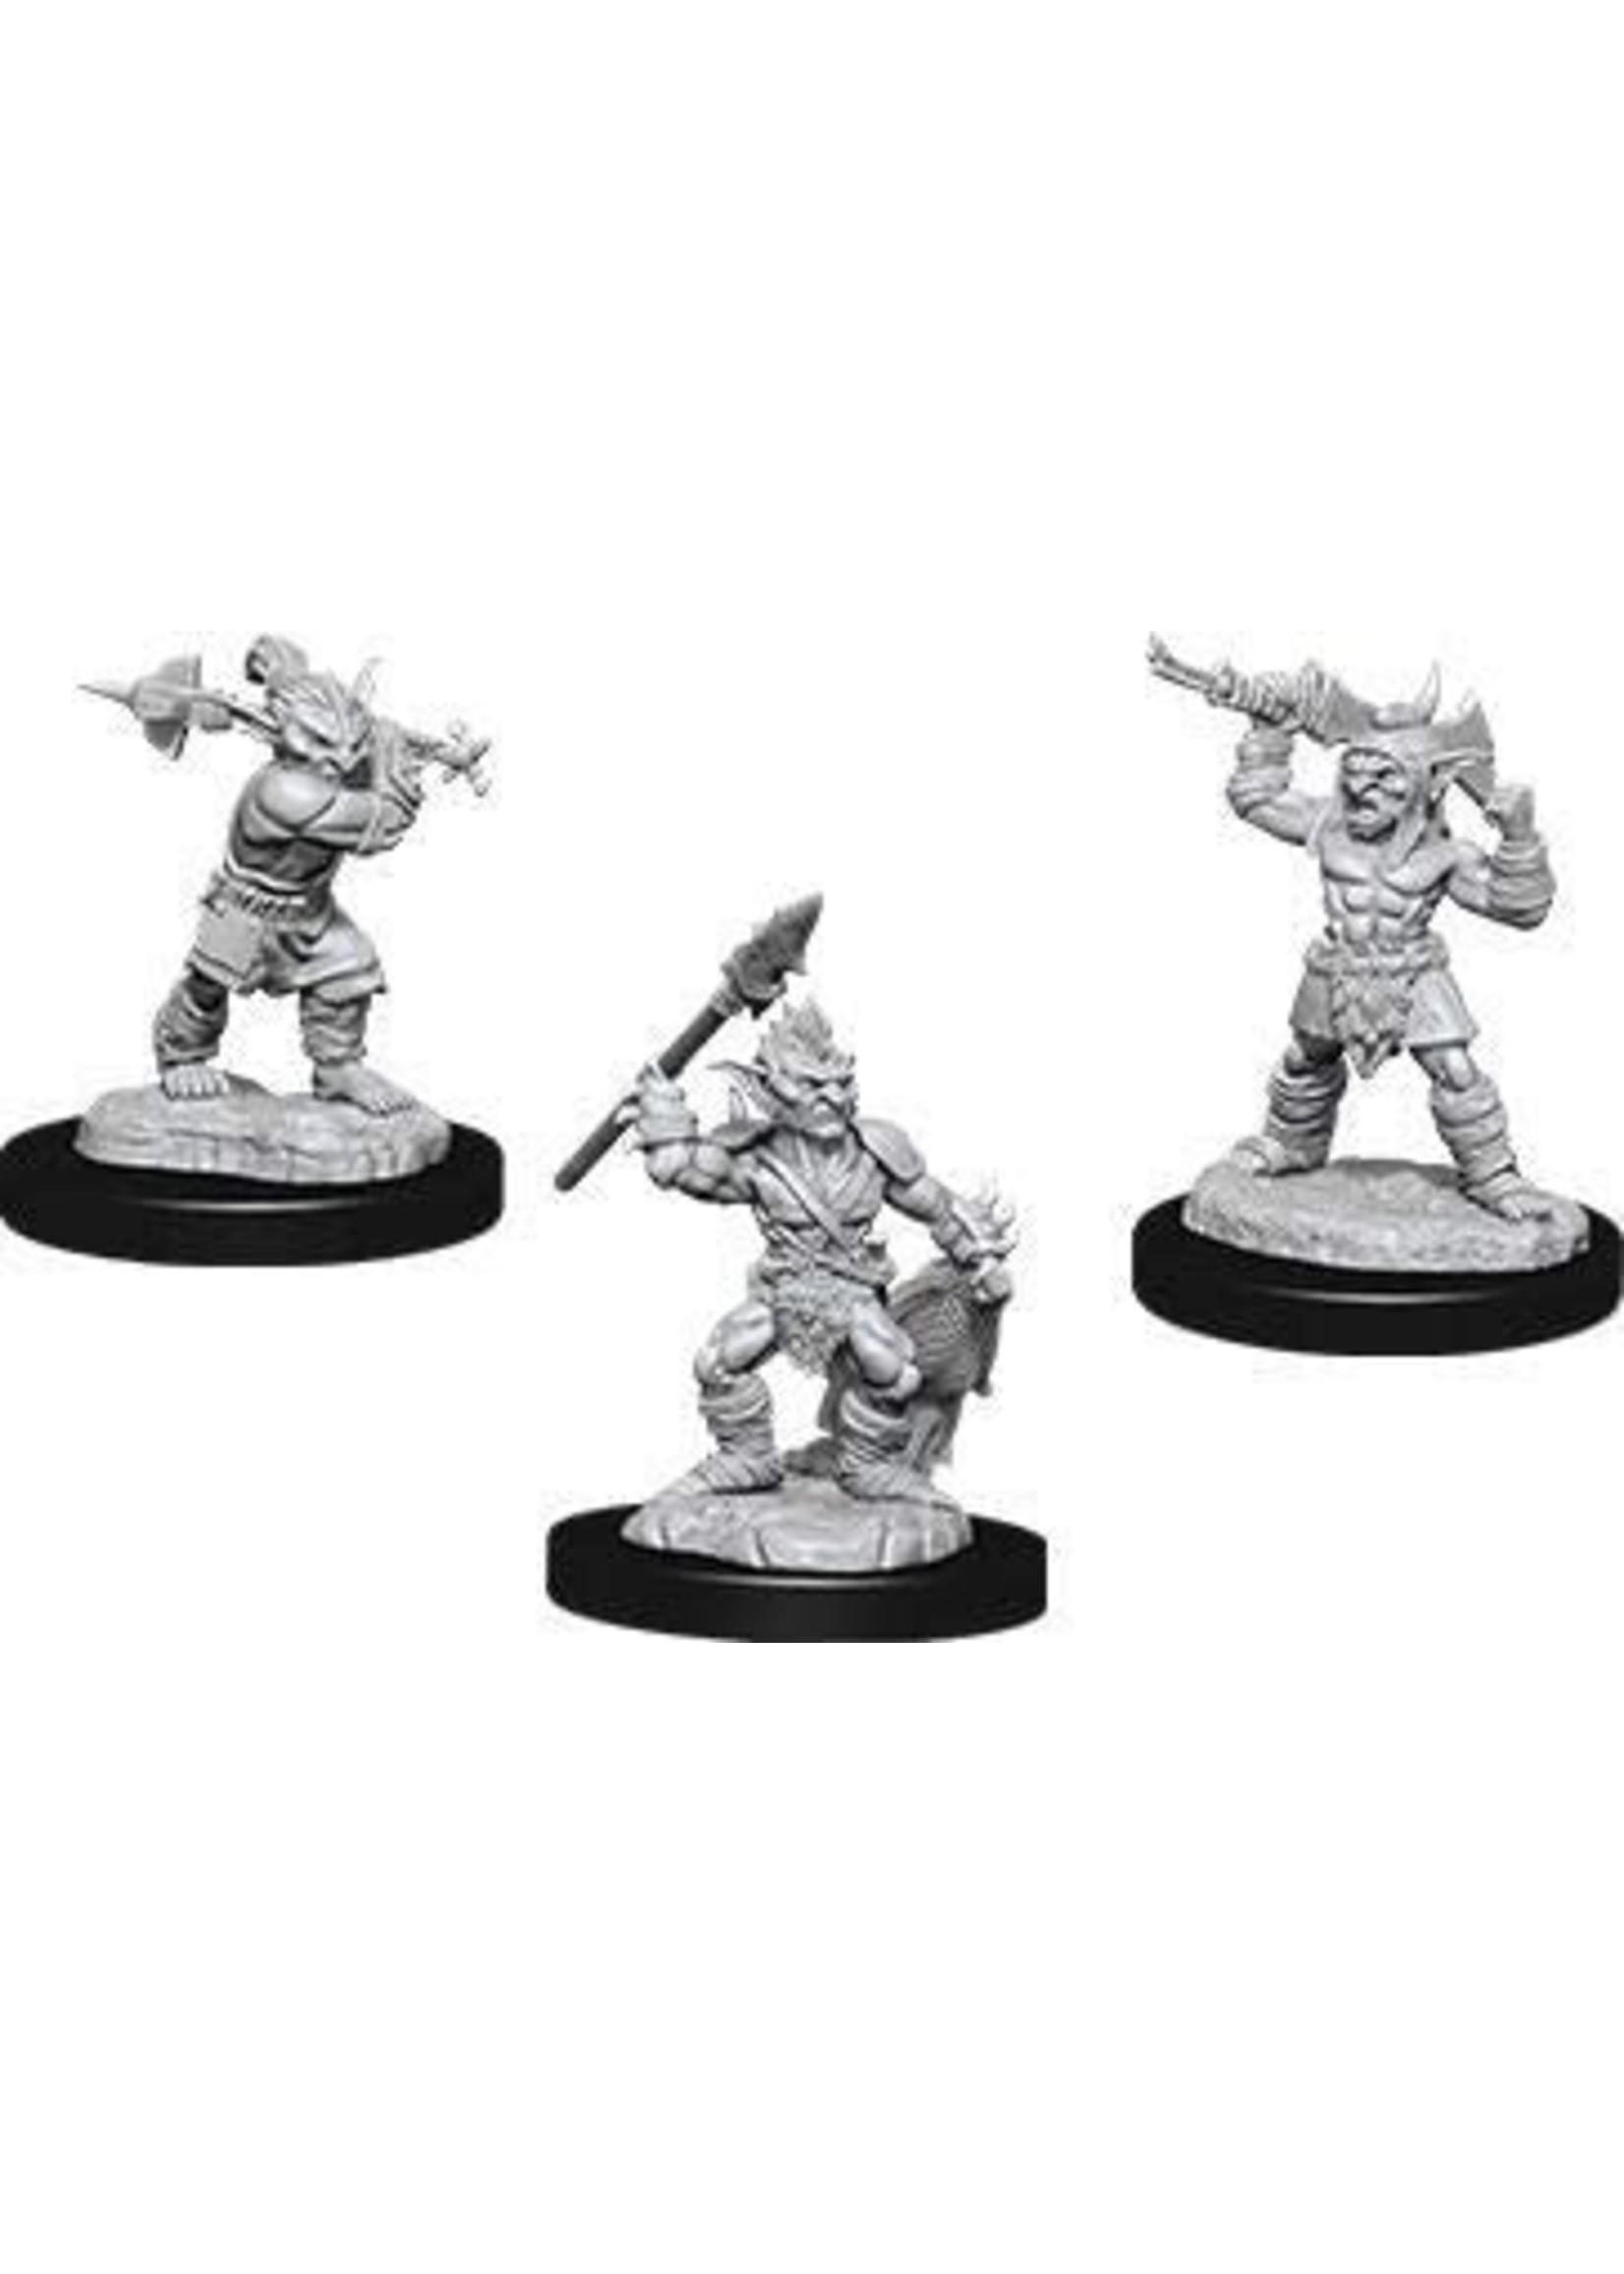 Dungeons & Dragons Nolzur`s Marvelous Unpainted Miniatures: W12 Goblins & Goblin Boss